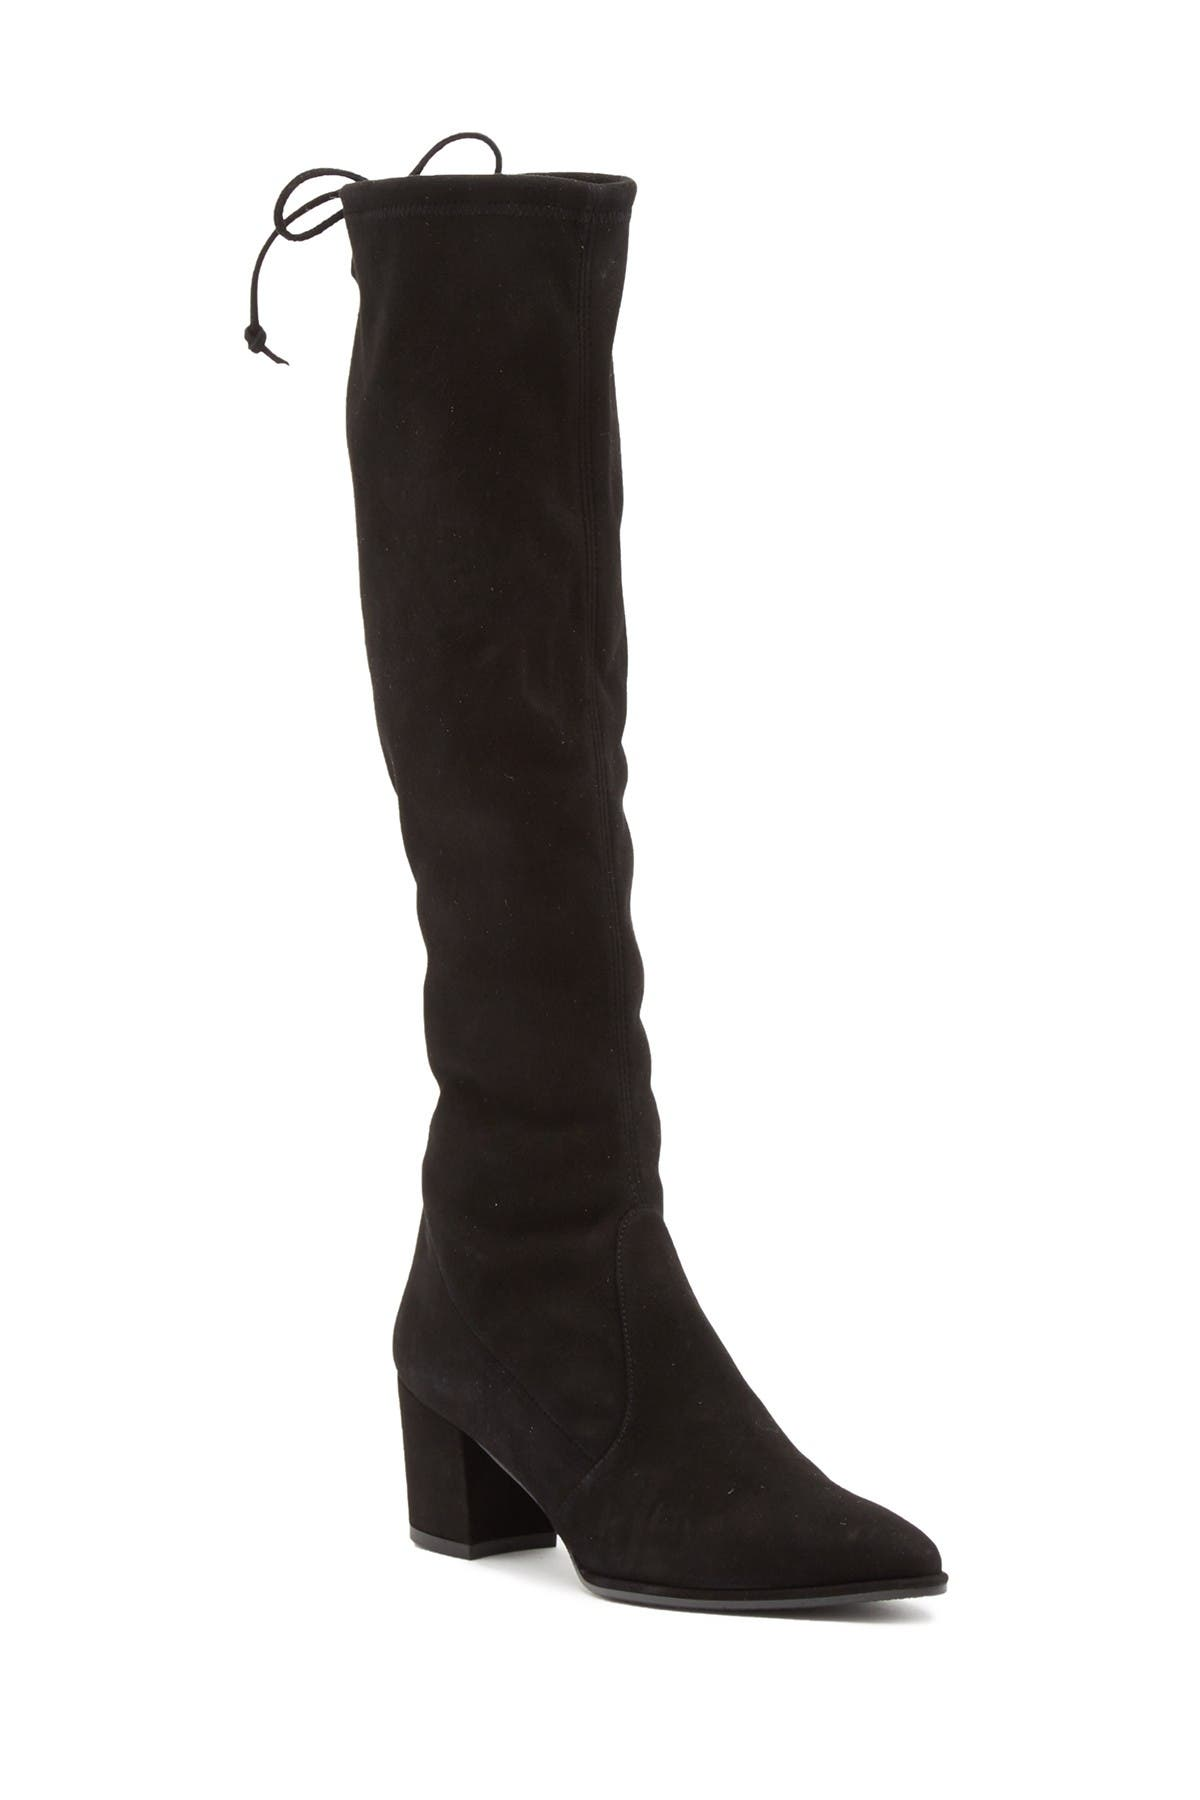 Image of Stuart Weitzman Cleveland Knee High Boot